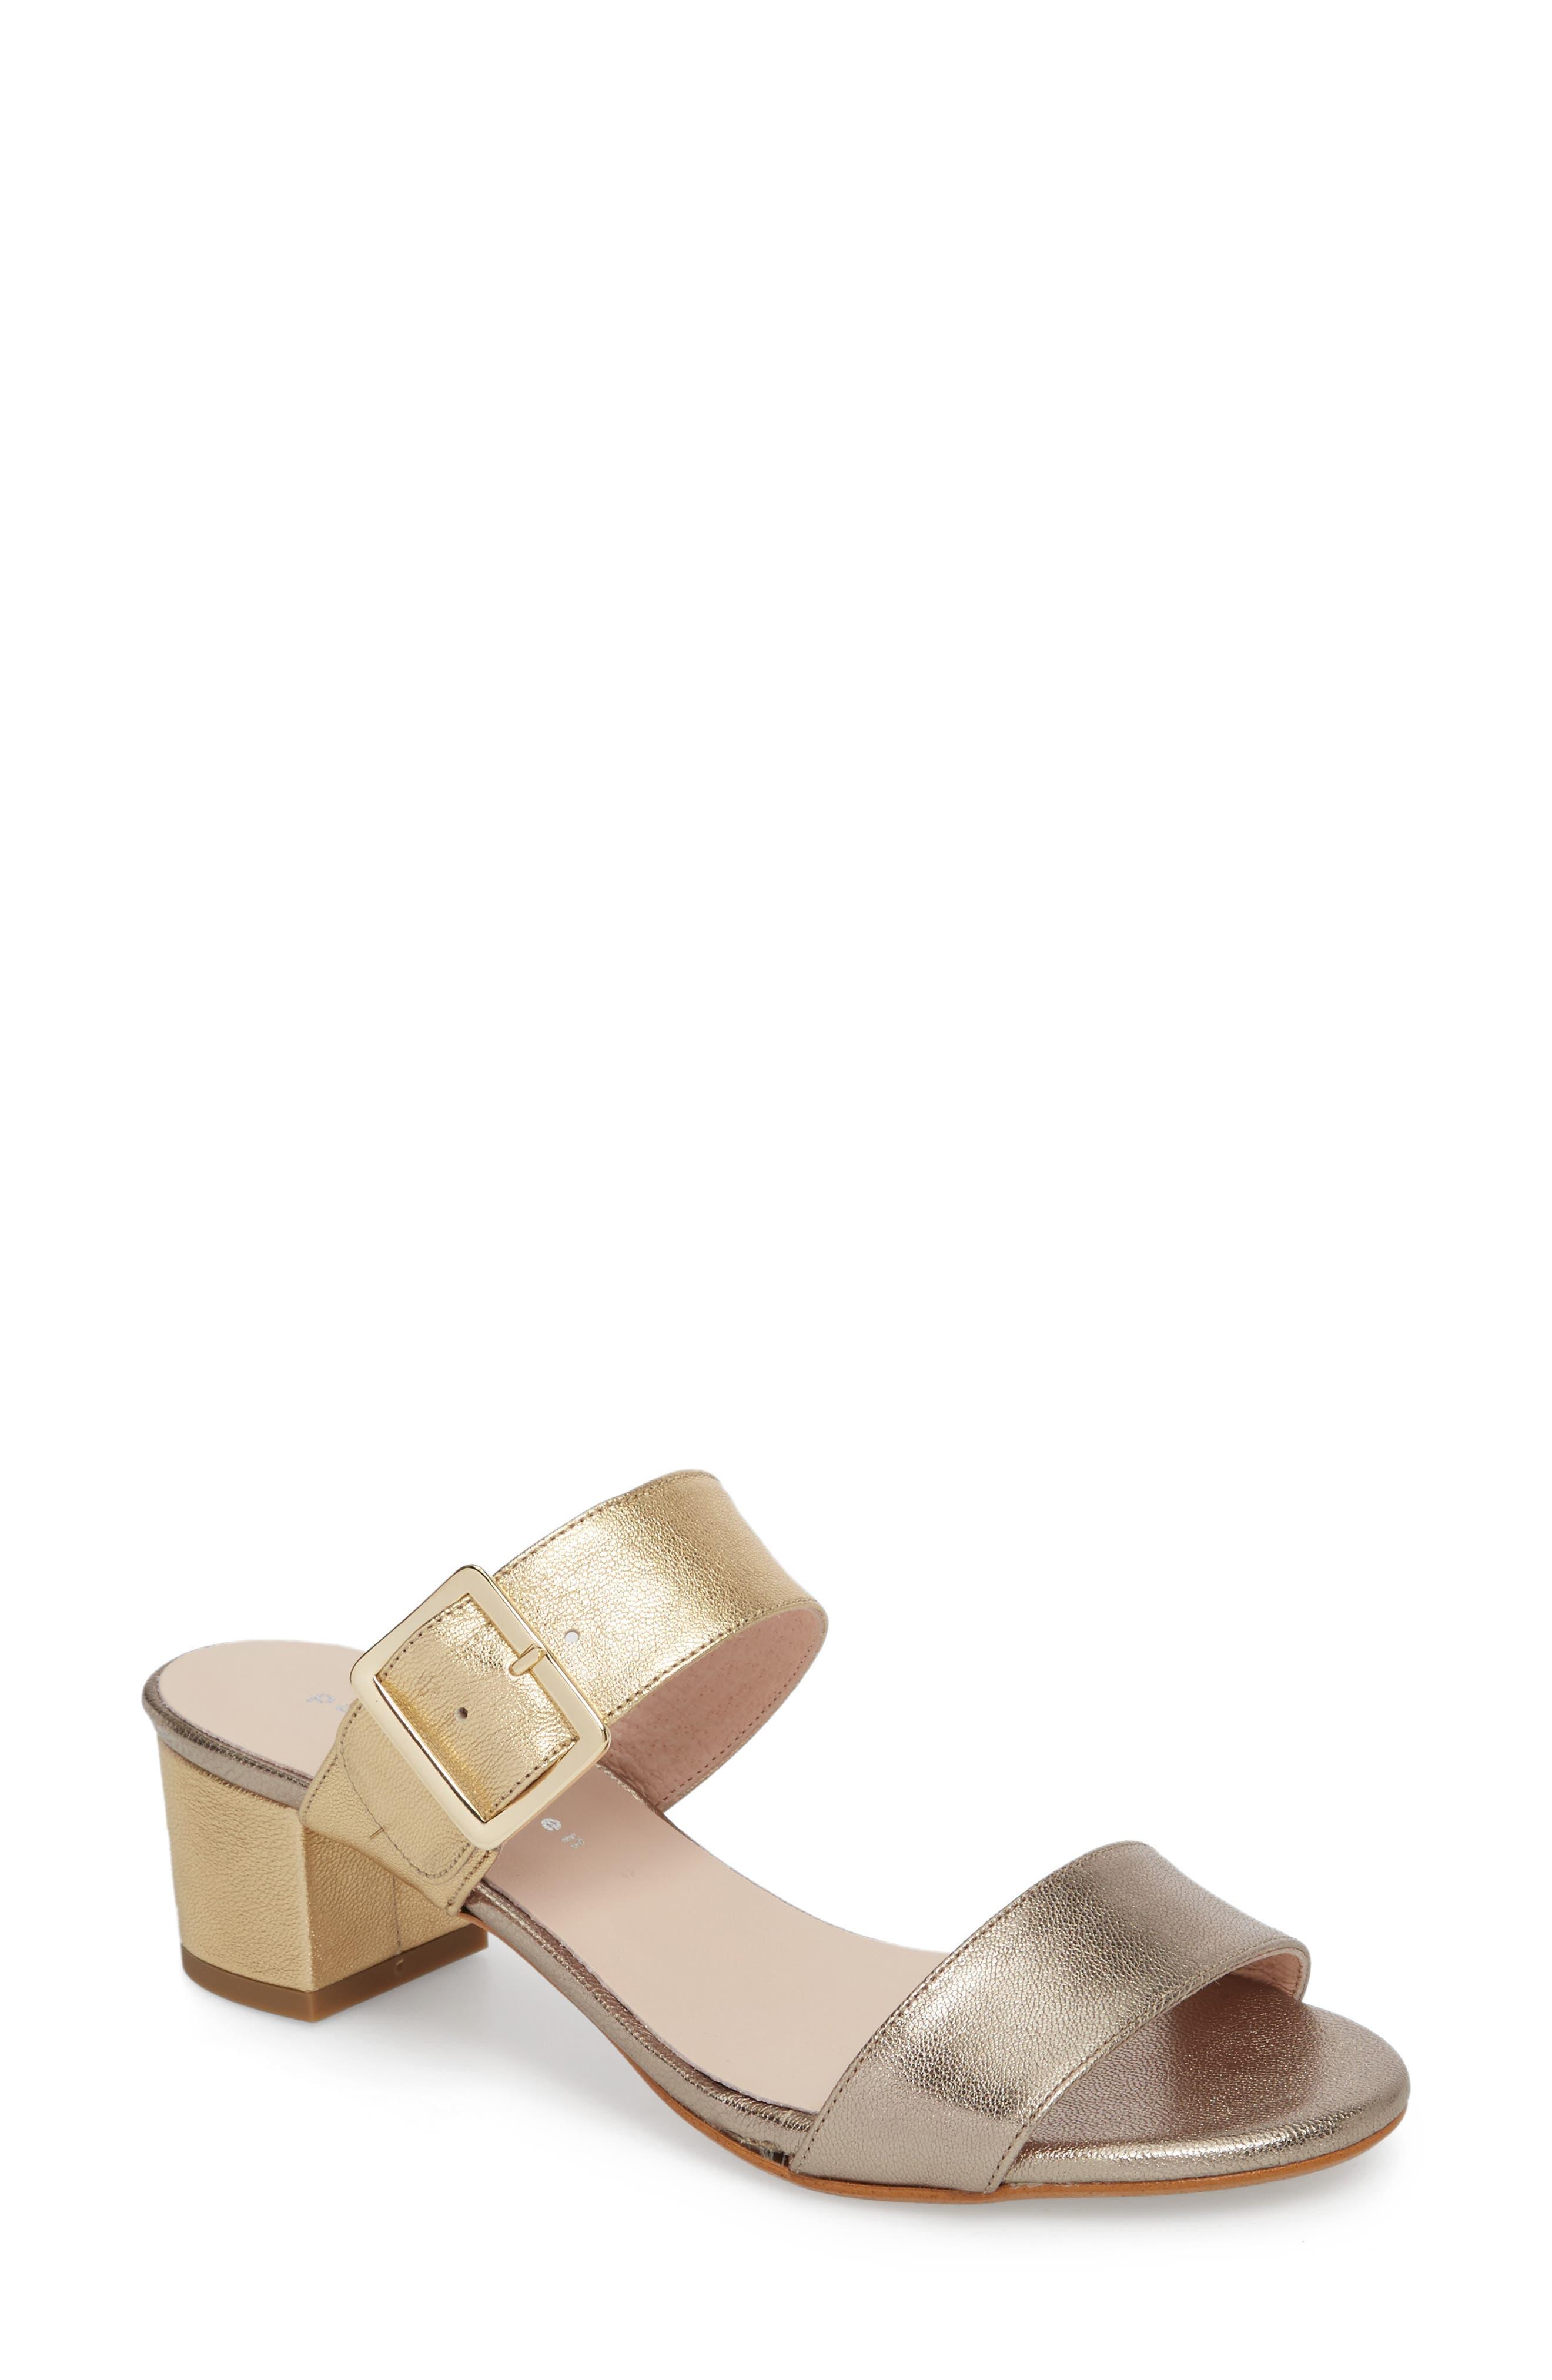 Ruth Slide Sandal,                             Main thumbnail 1, color,                             Gold/ Bronze Leather